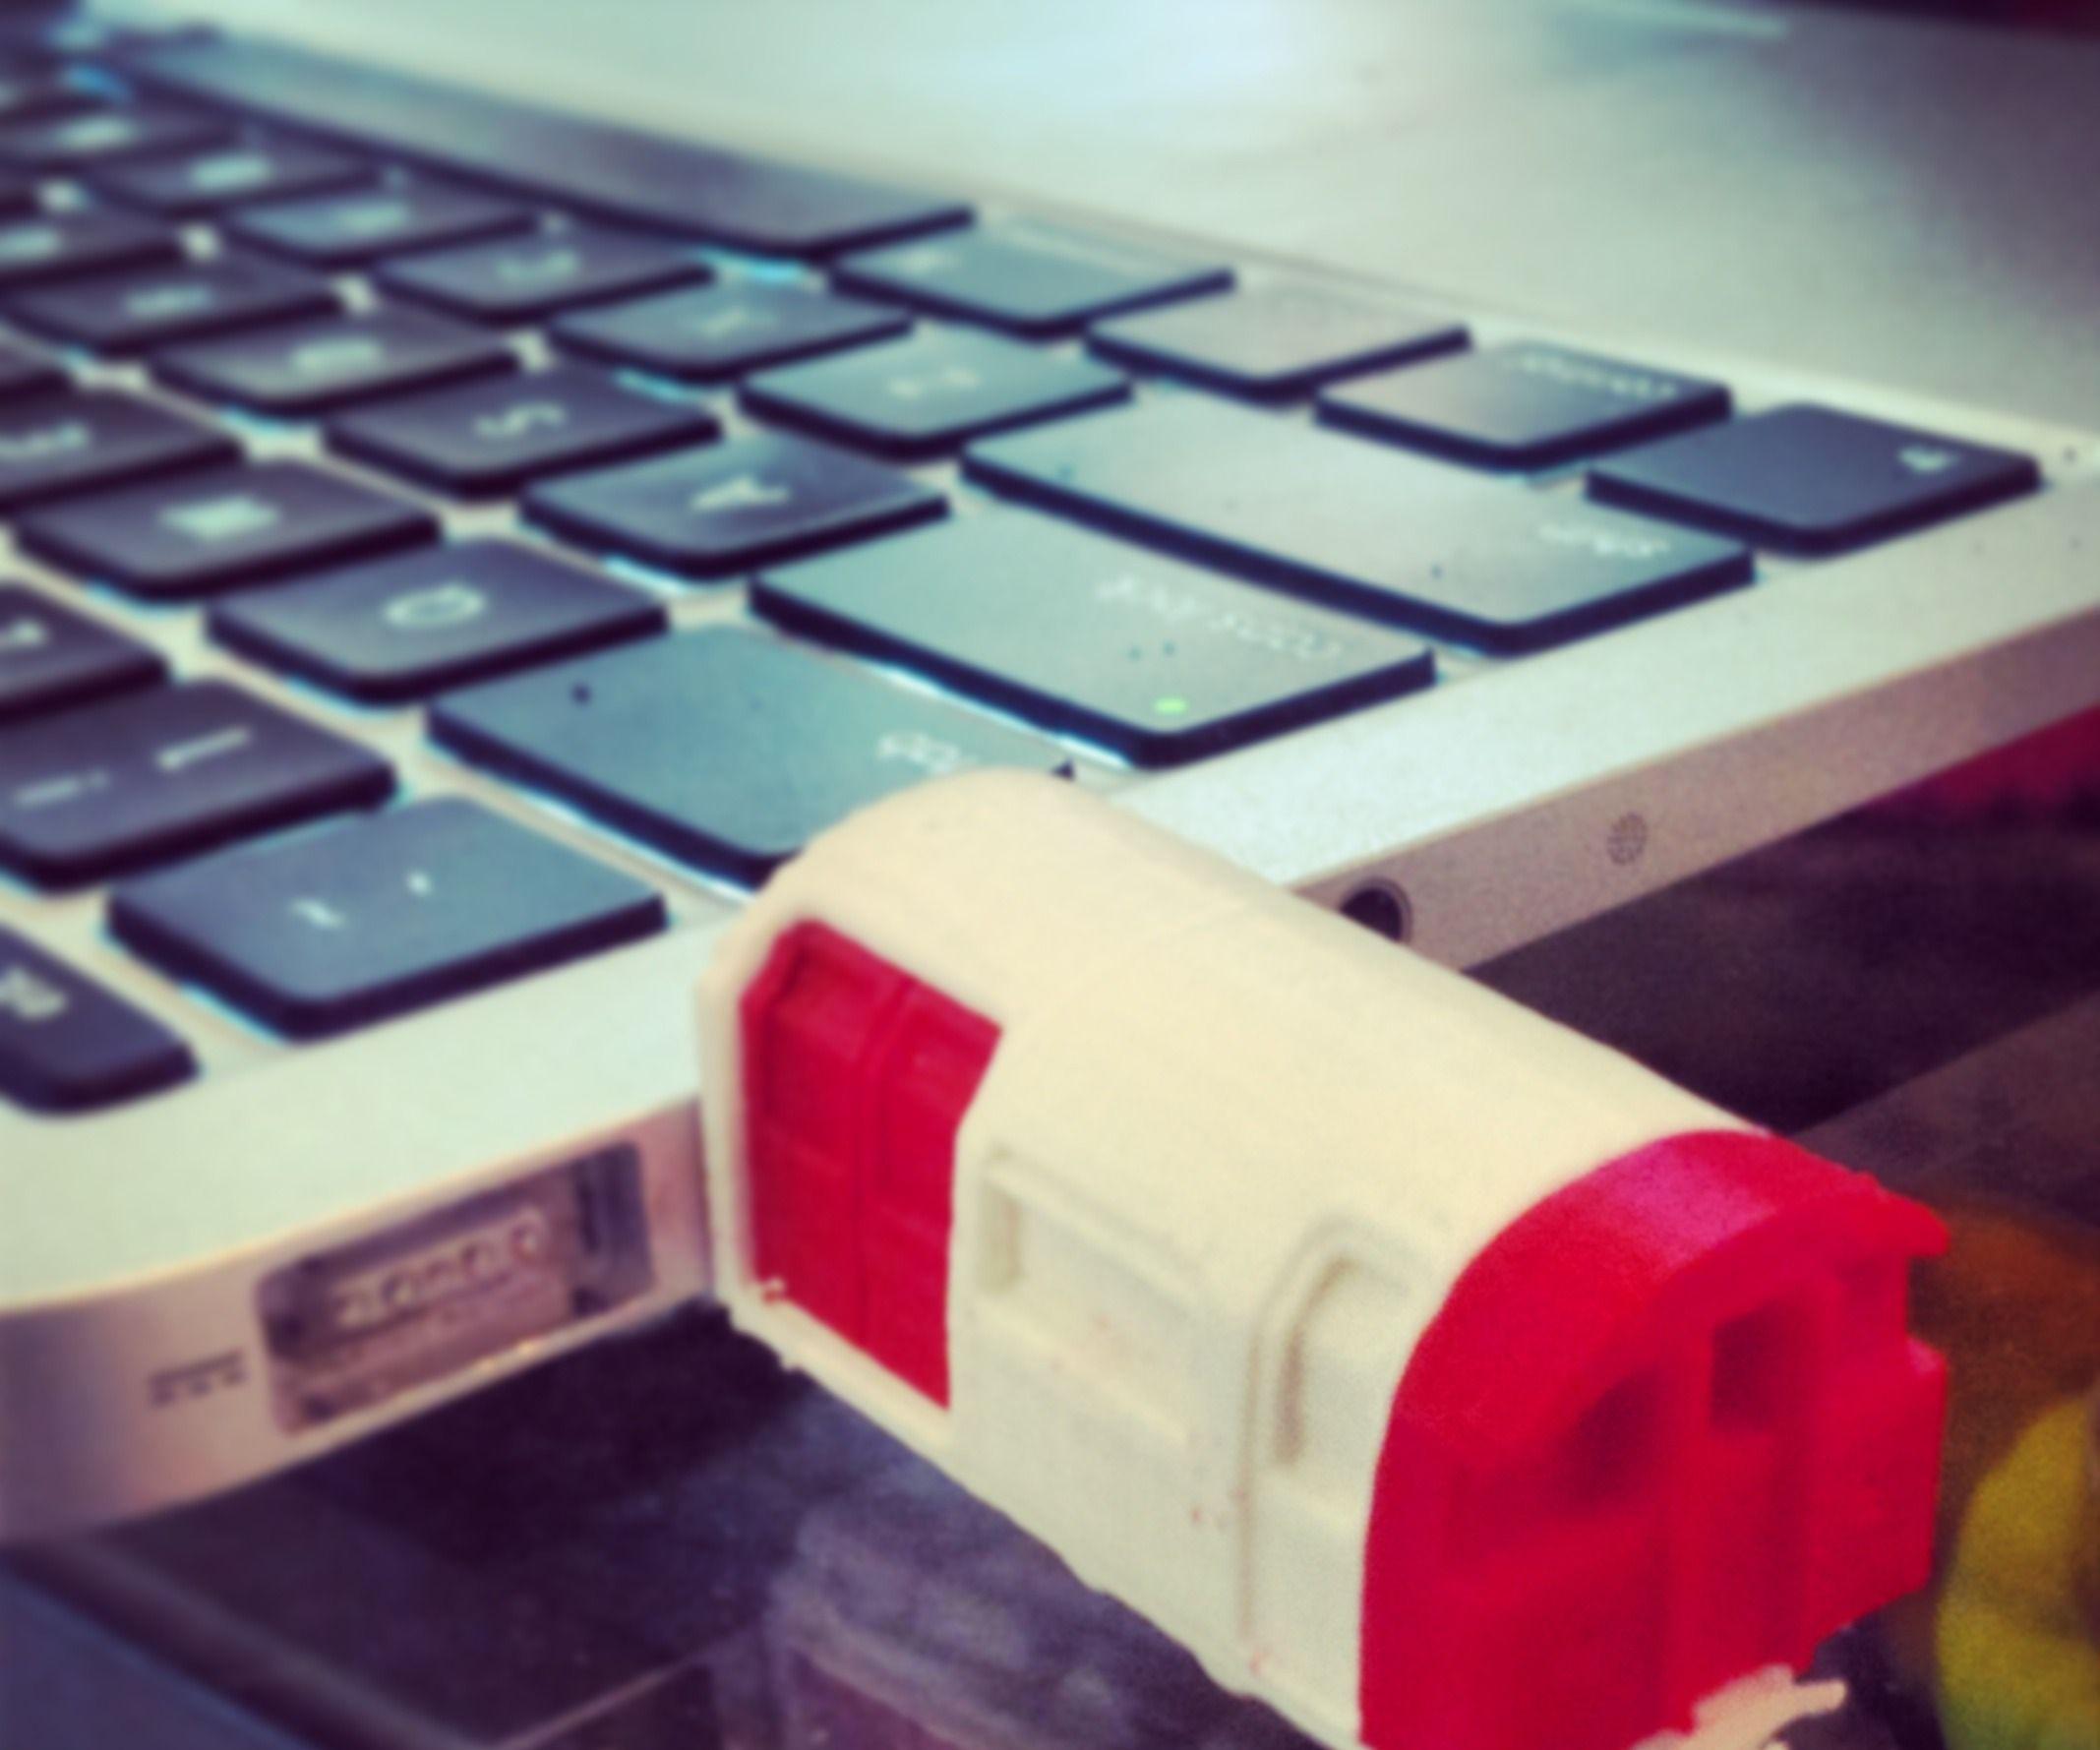 TRAIN USB MEMORY ver.2